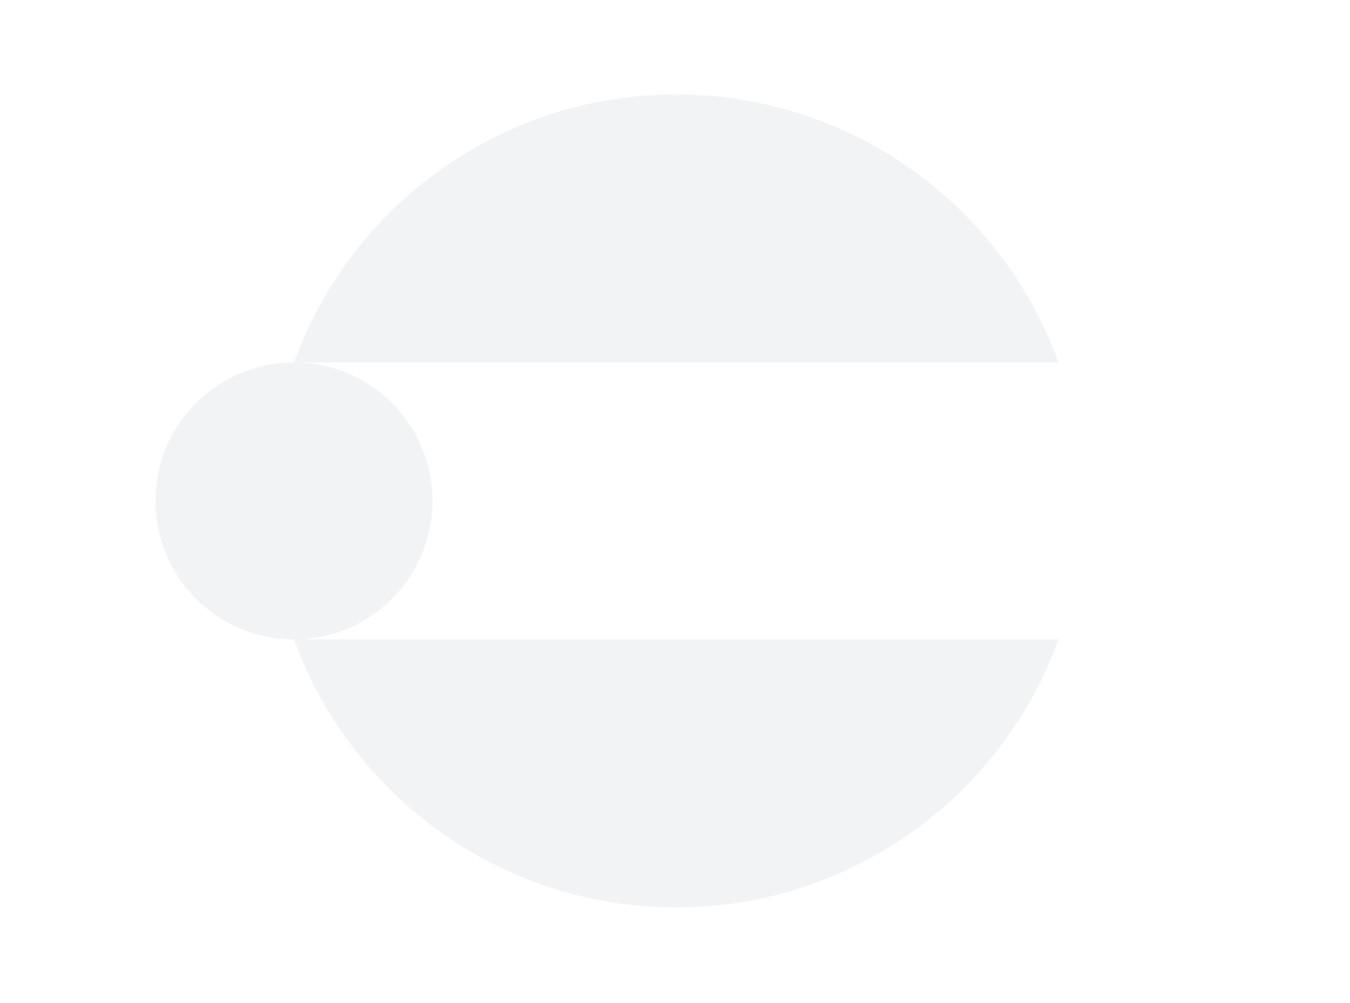 Dreadbox Erebus V3 Duophonic Semi-Modular